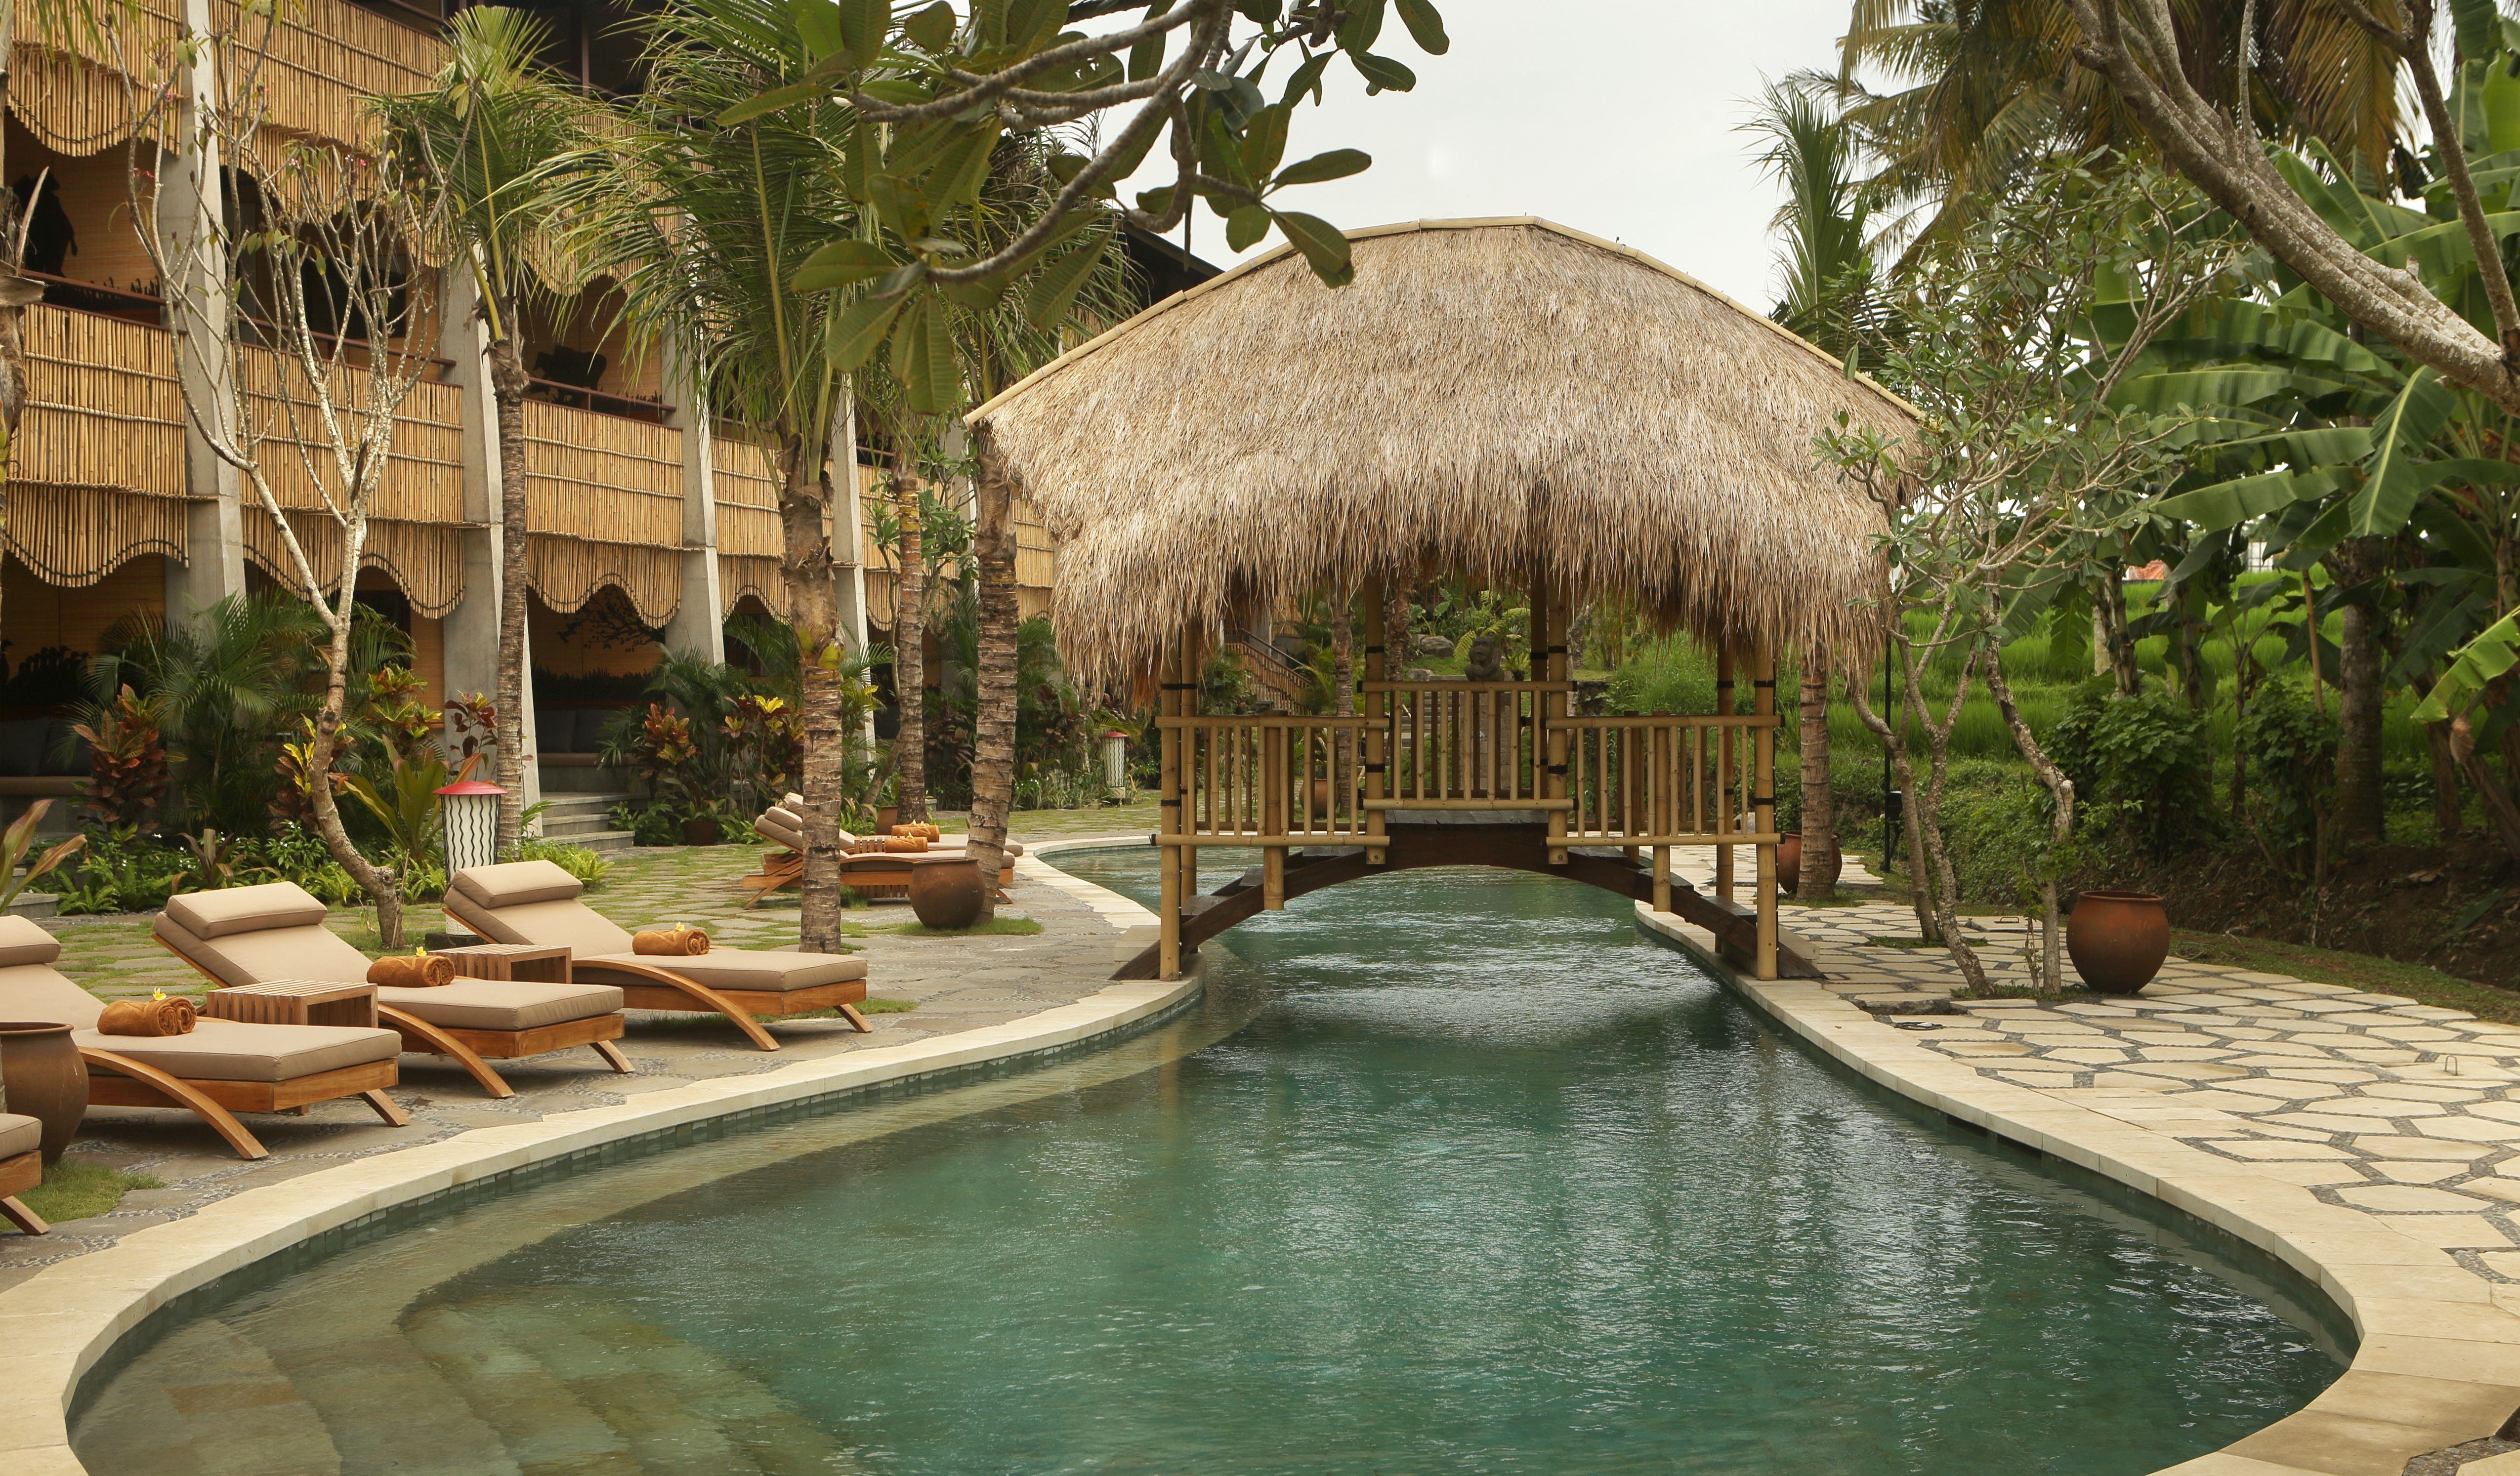 The Main Pool At The Alaya Resort In Ubud, Bali